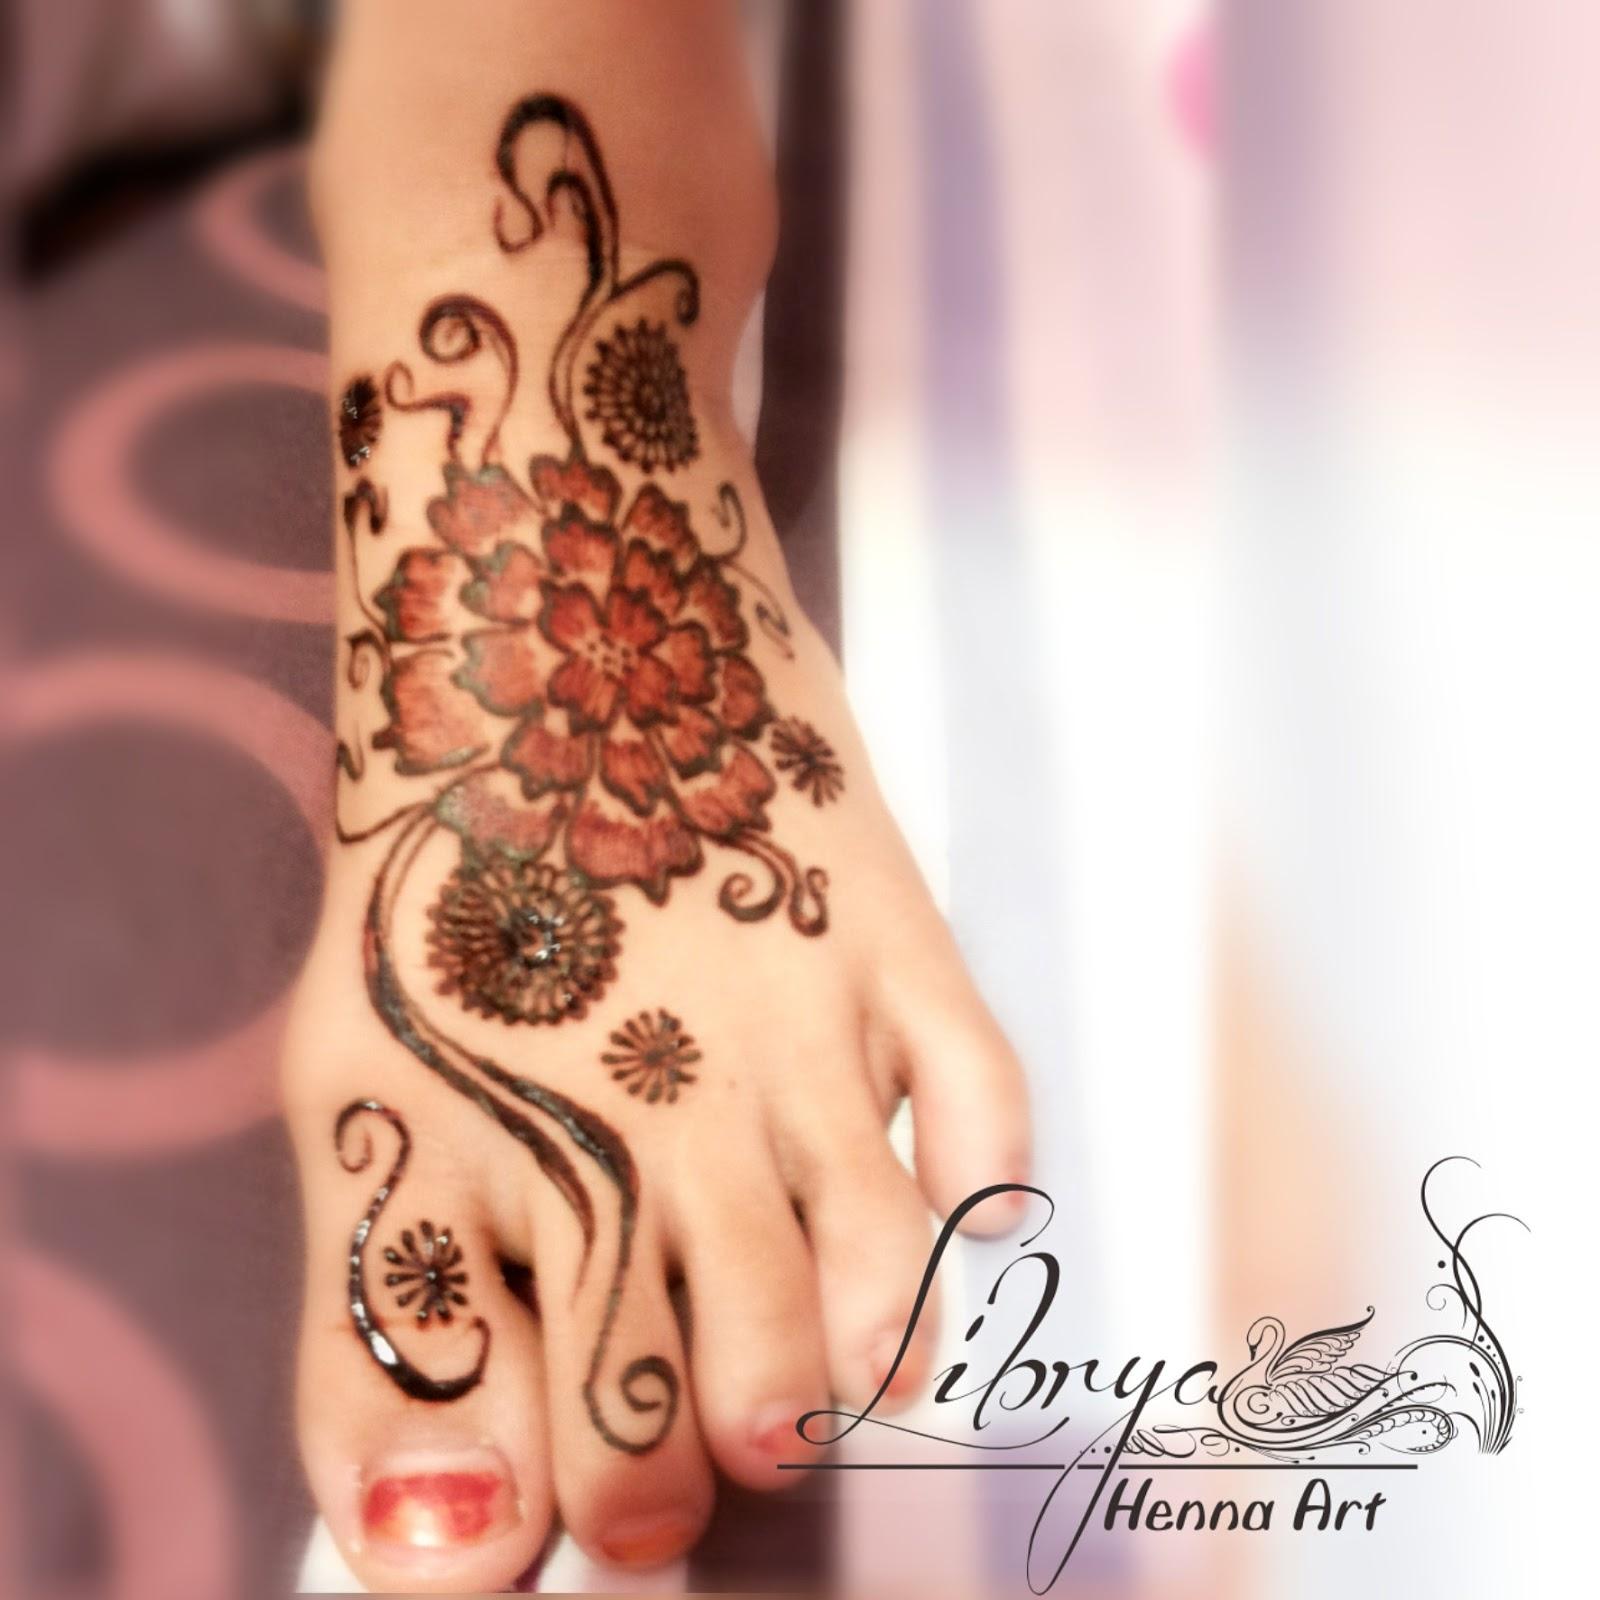 Librya Henna Art